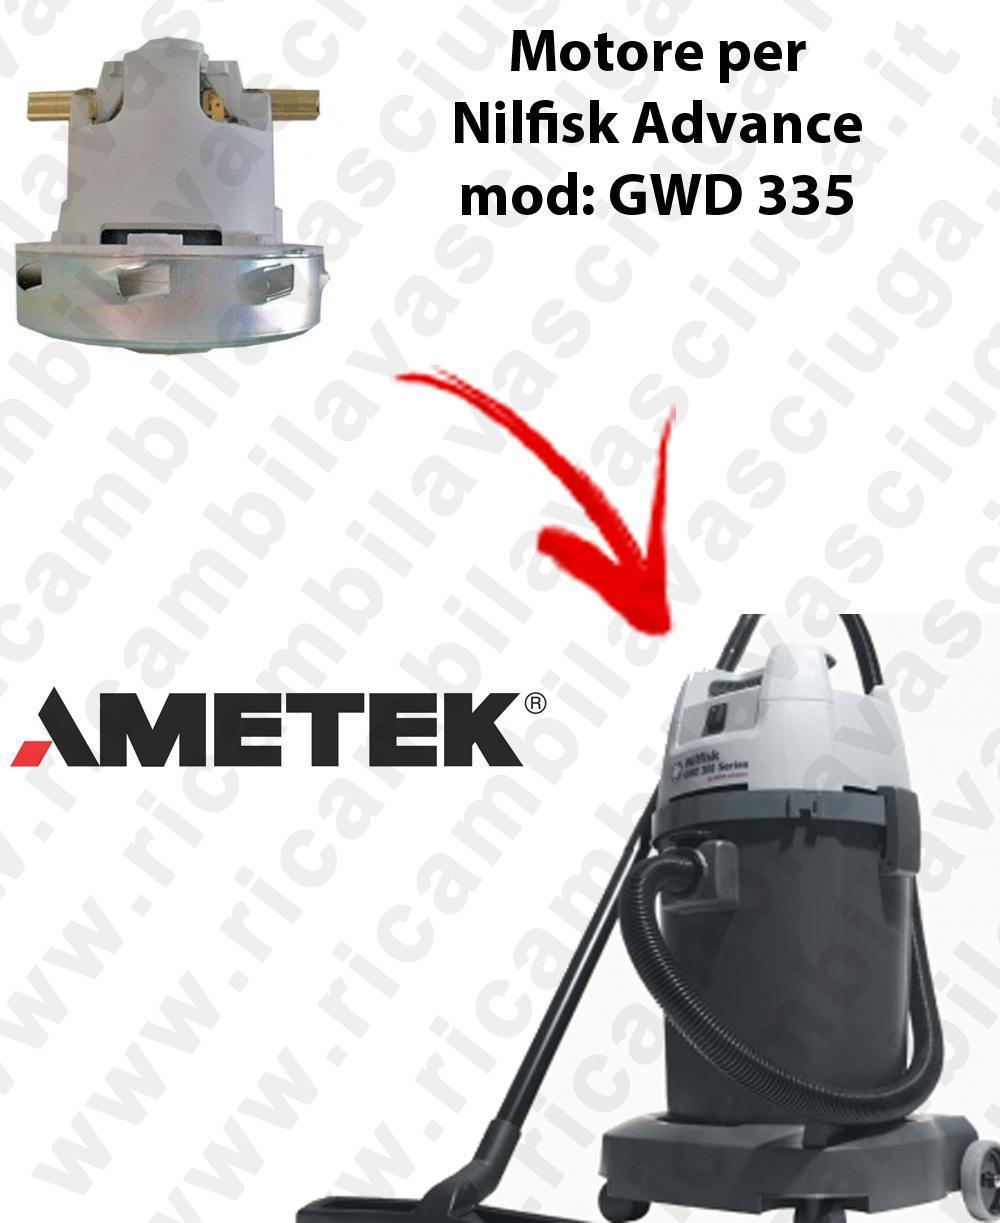 GWD 335  MOTEUR ASPIRATION AMETEK pour aspirateur Nilfisk Advance